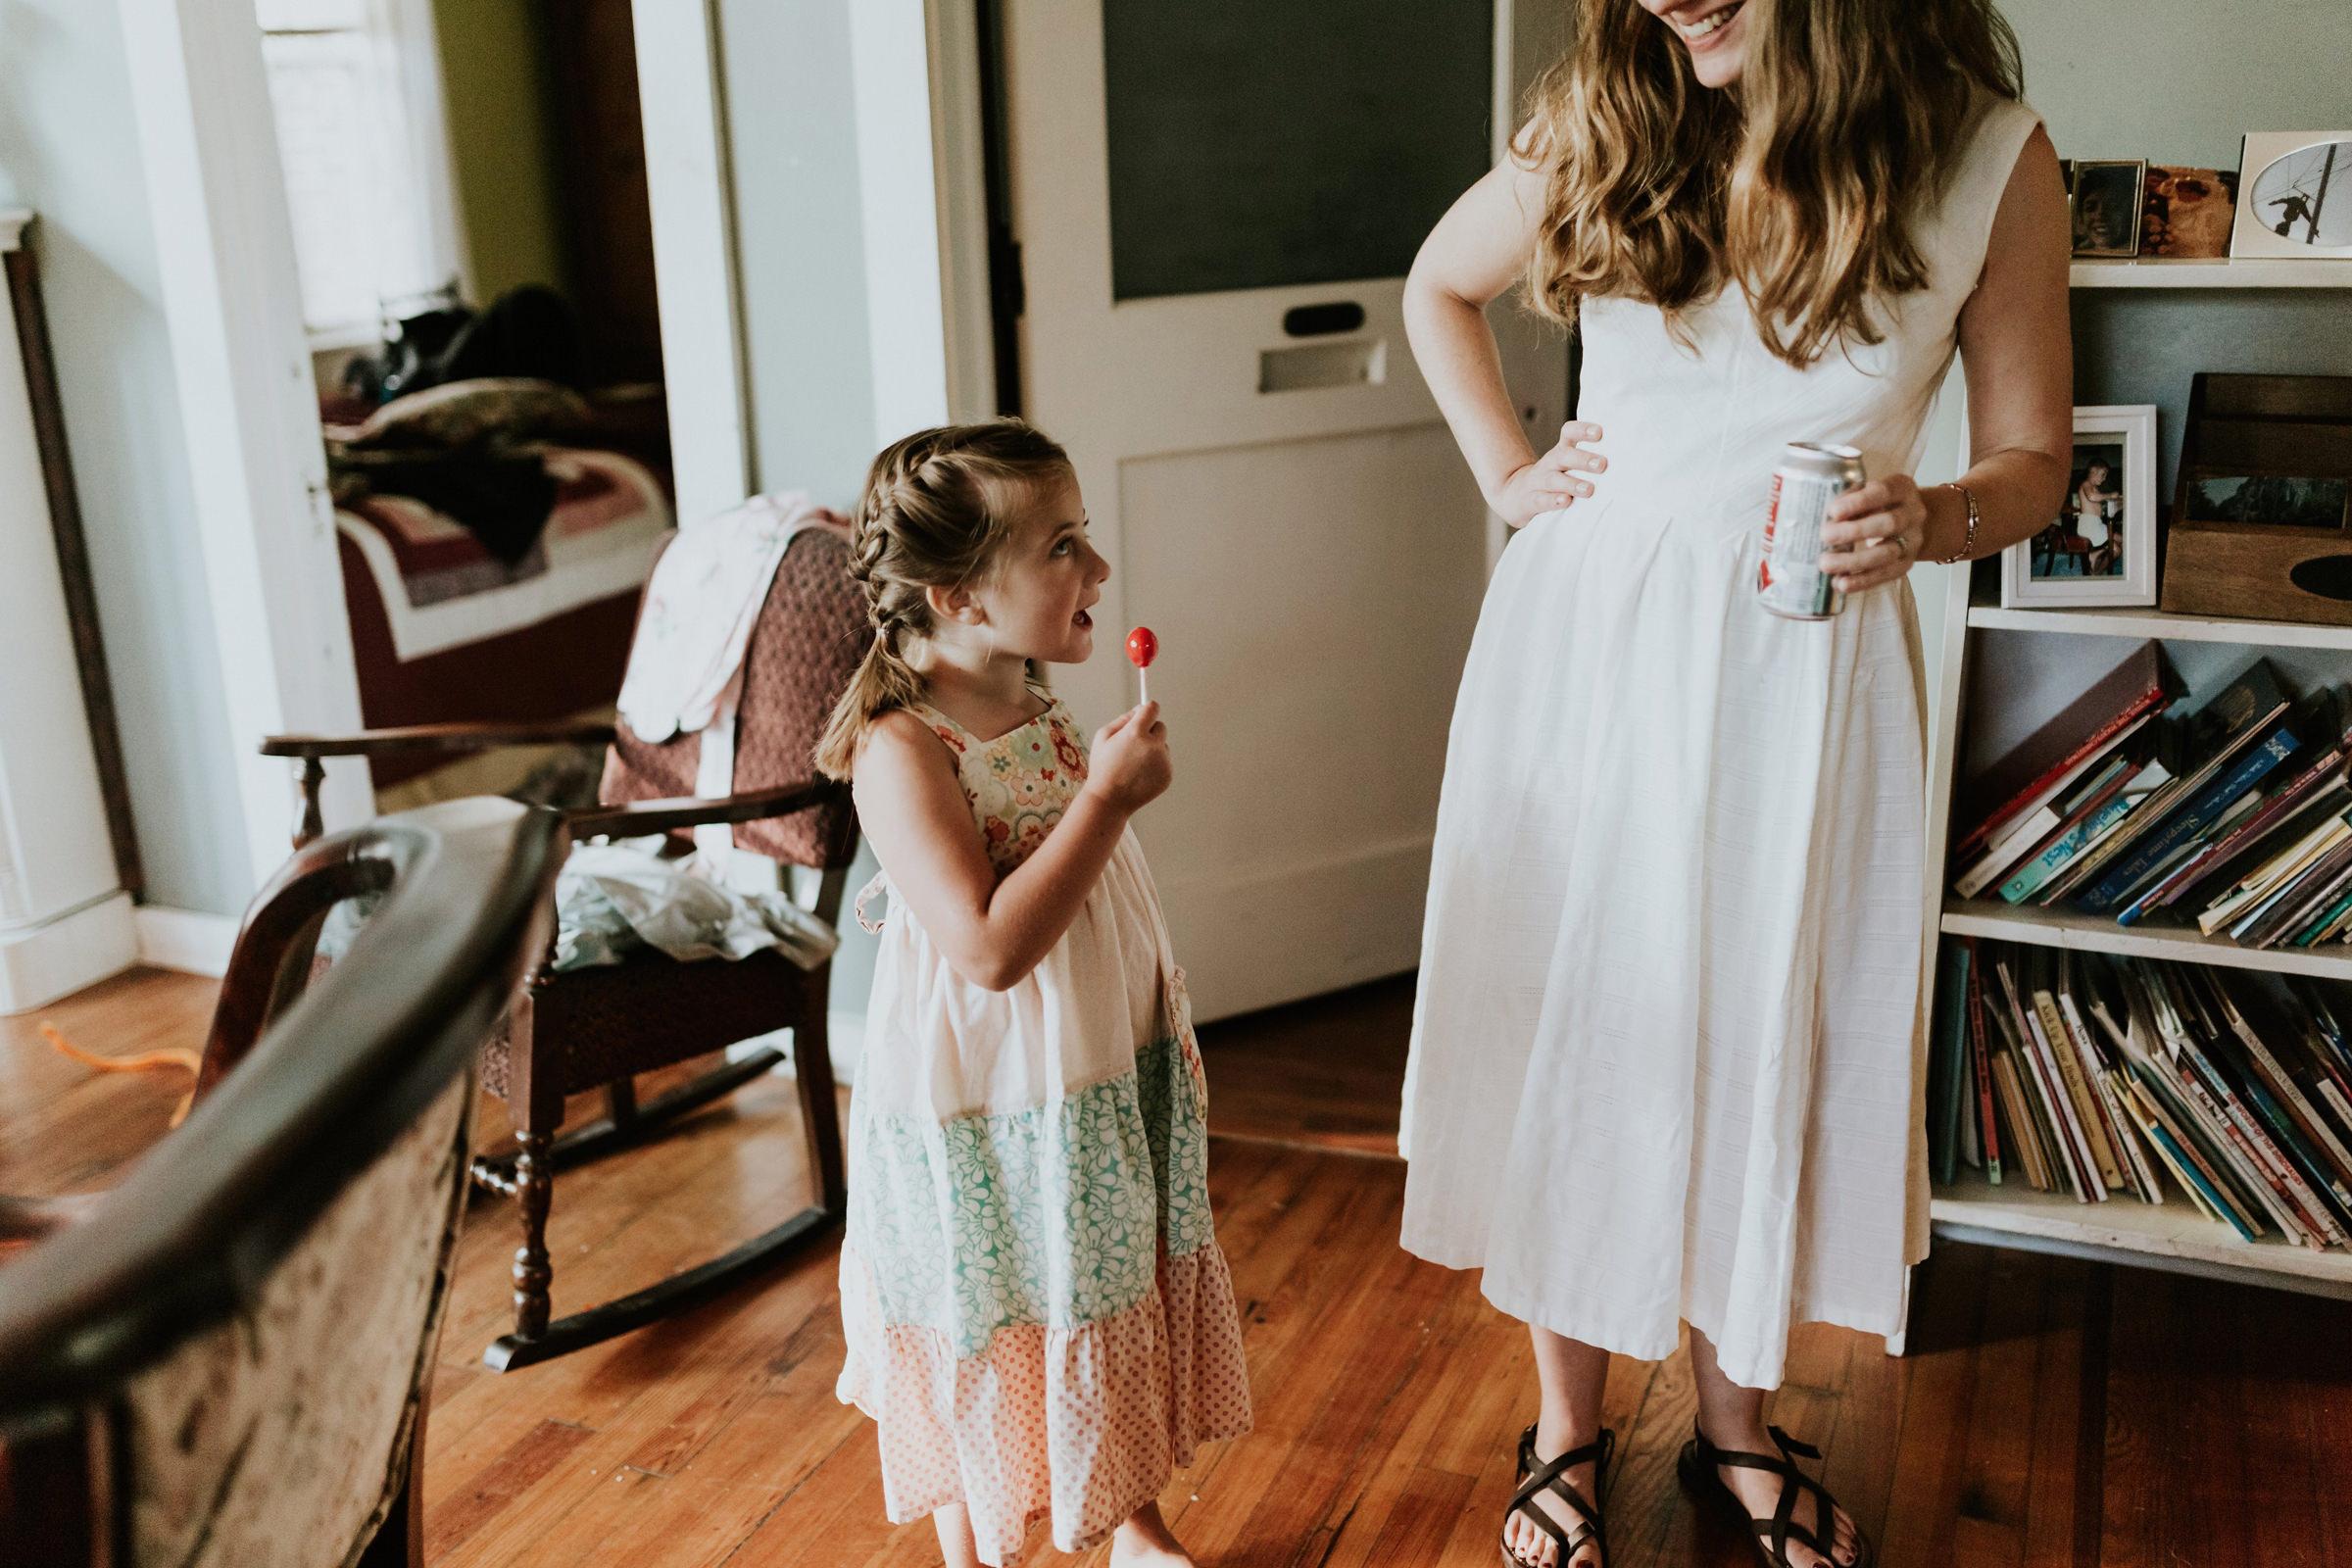 Kentucky_Candid_Wedding_Photographer_046.jpg